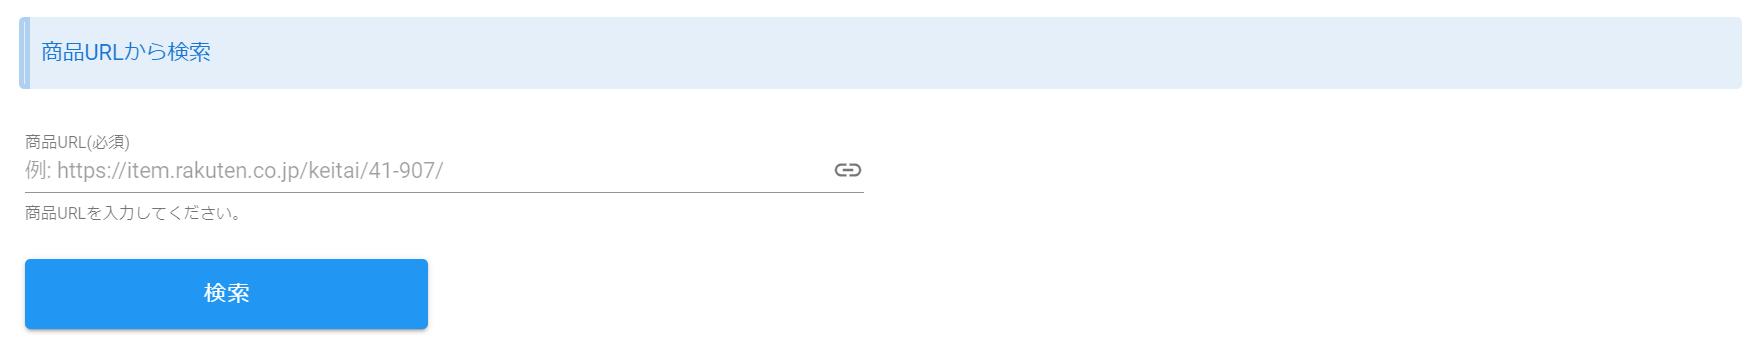 URL絞り込み検索操作画面